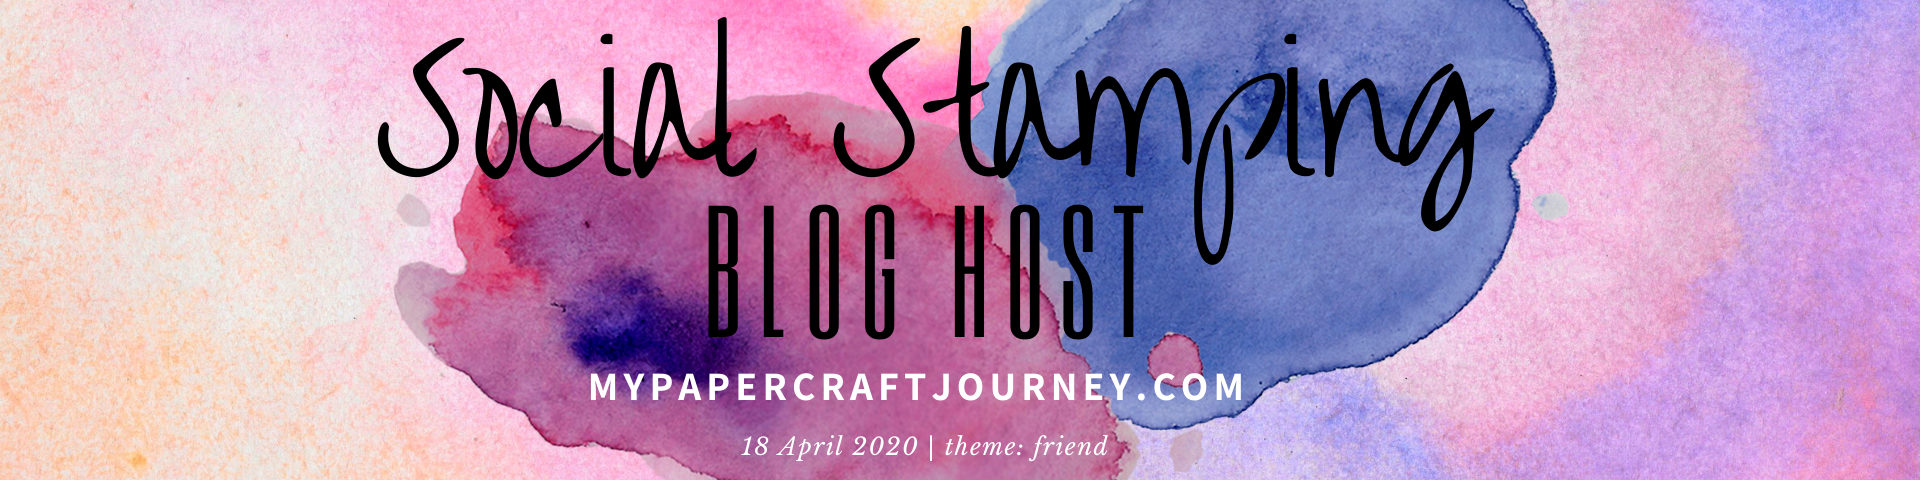 Social Stamping Blog Host Header 18 April friend